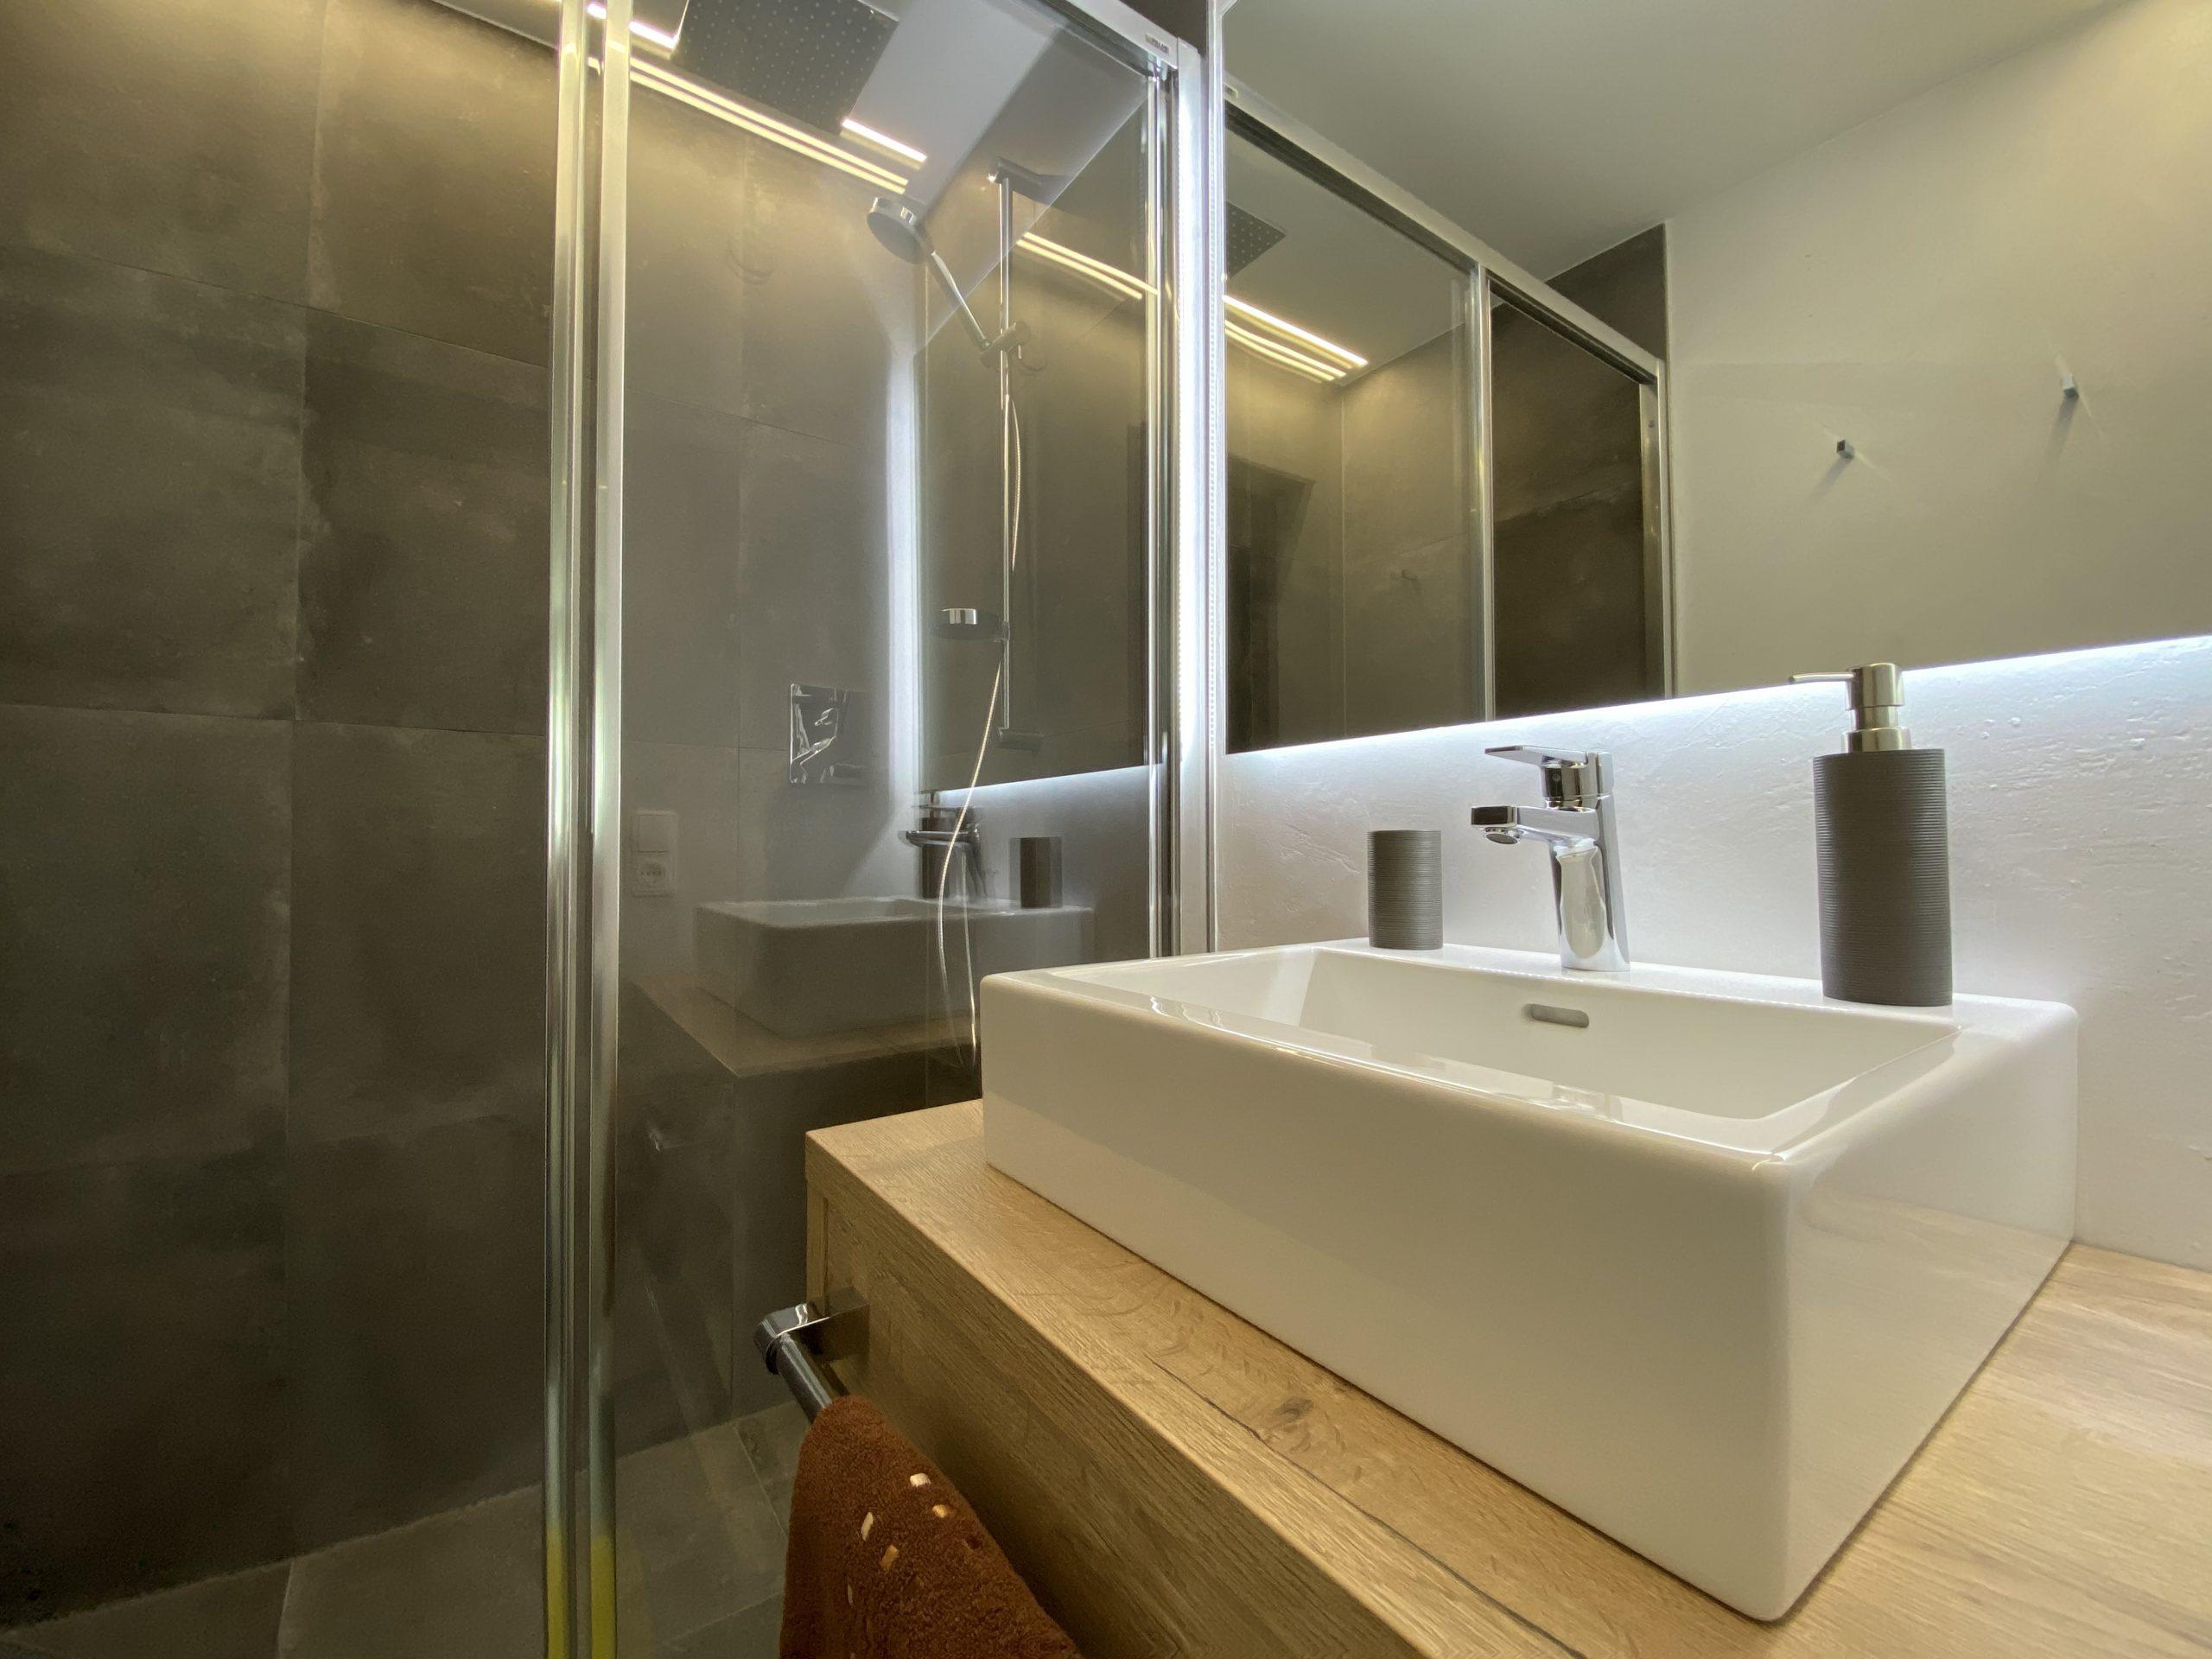 Apartment 3, bathroom 2